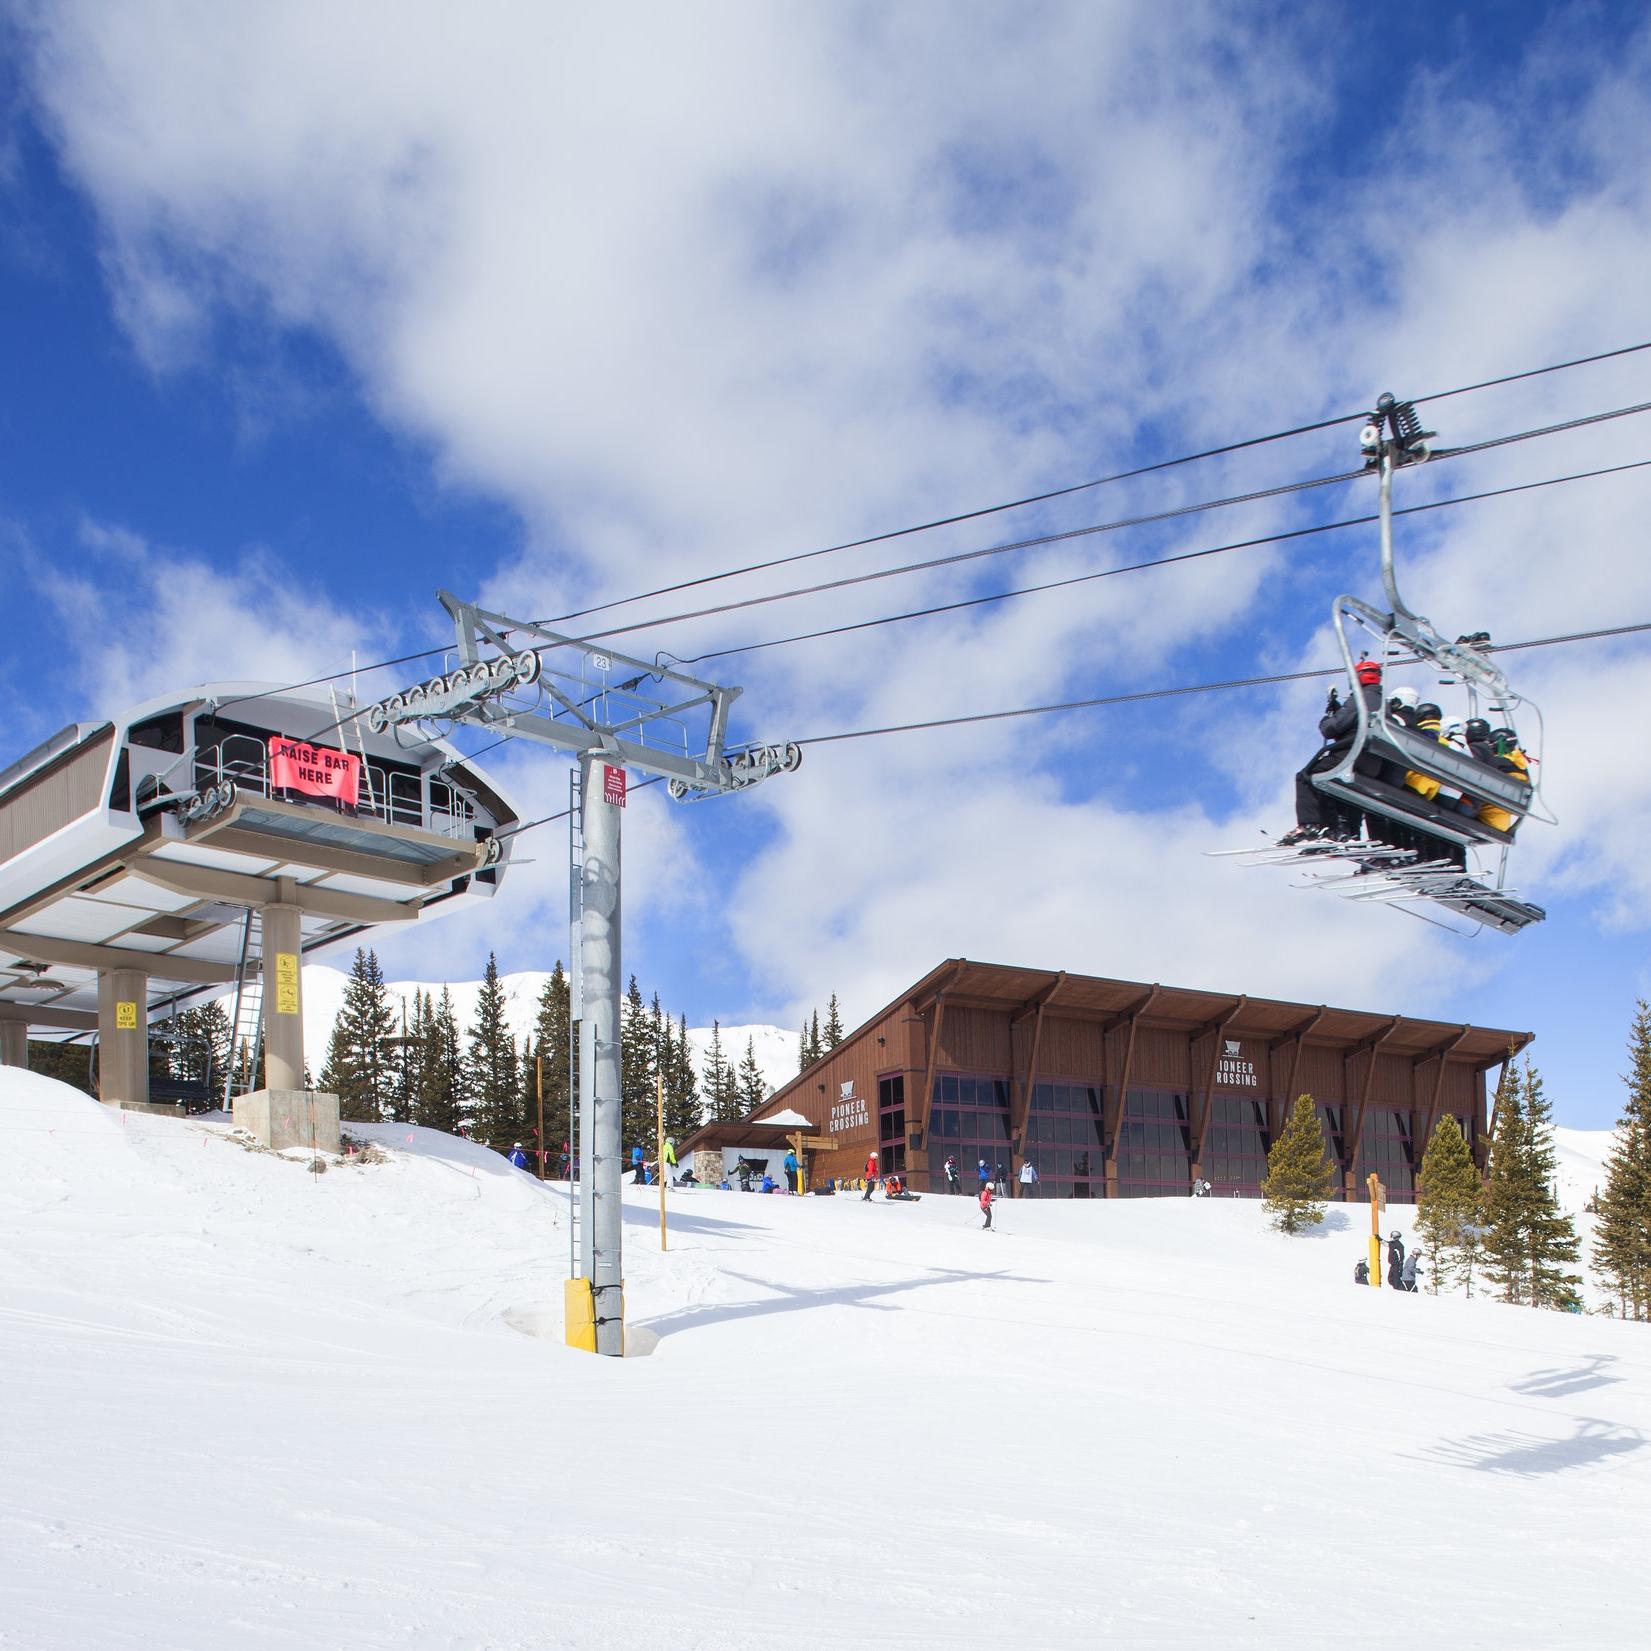 pioneer crossing lodge at breckenridge ski resort -